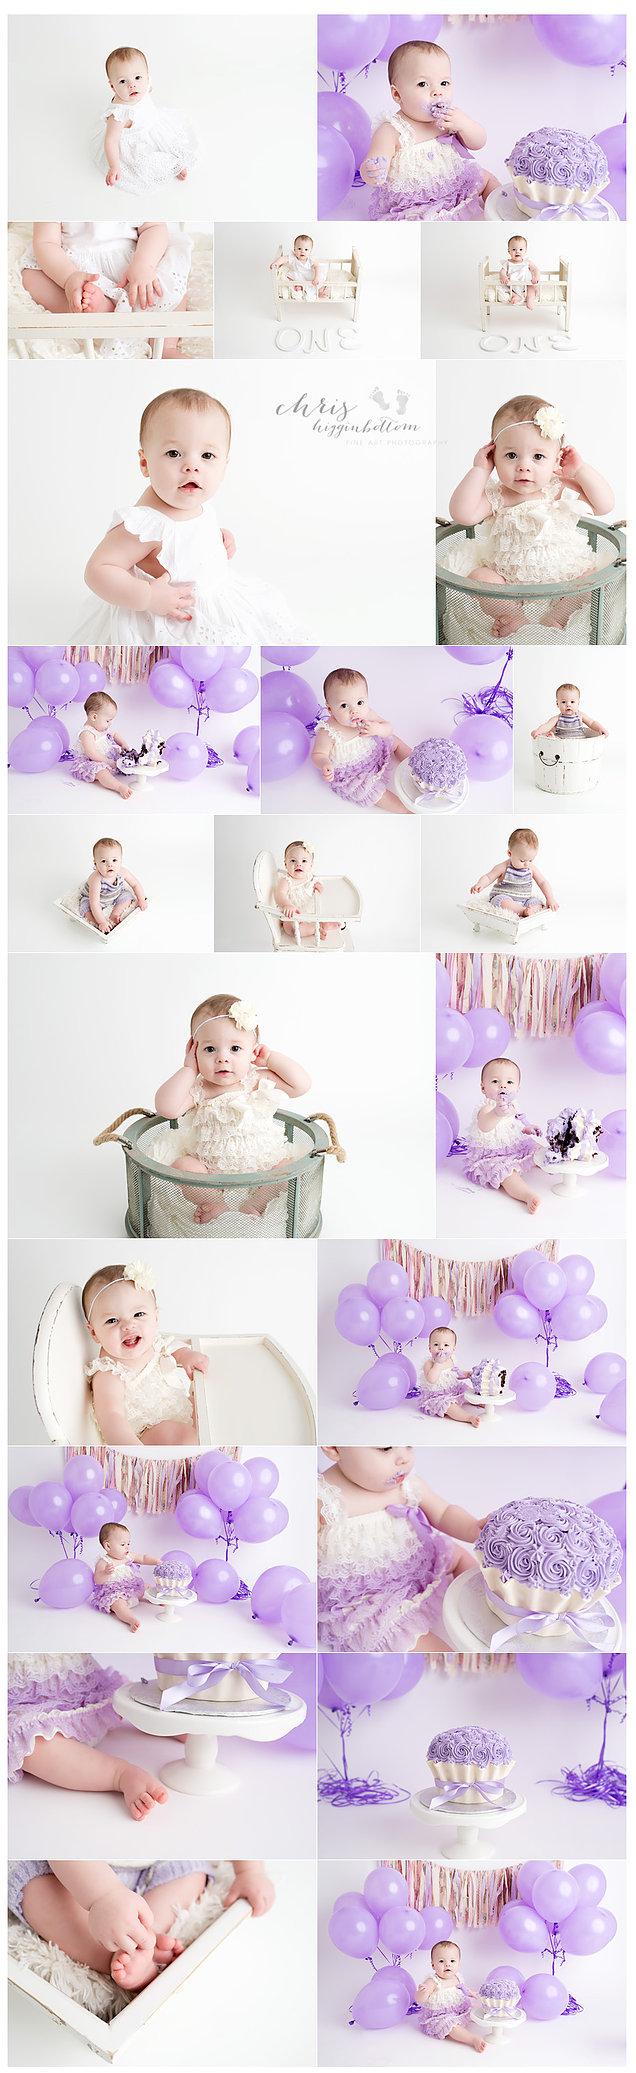 Chris Higginbottom   Newborn Photography Victoria BC